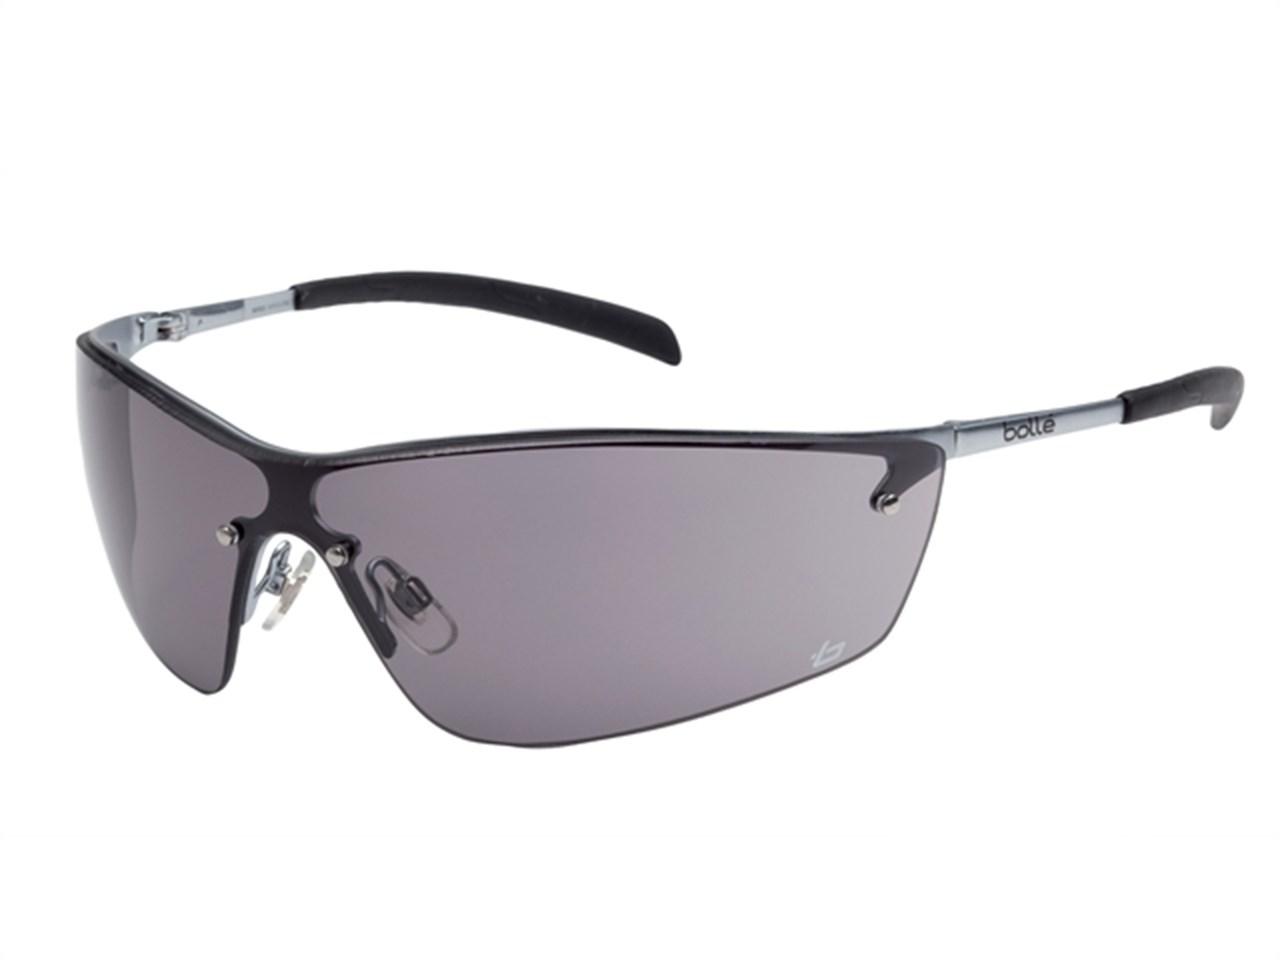 BOLLE Silium Safety Glasses - Smoke